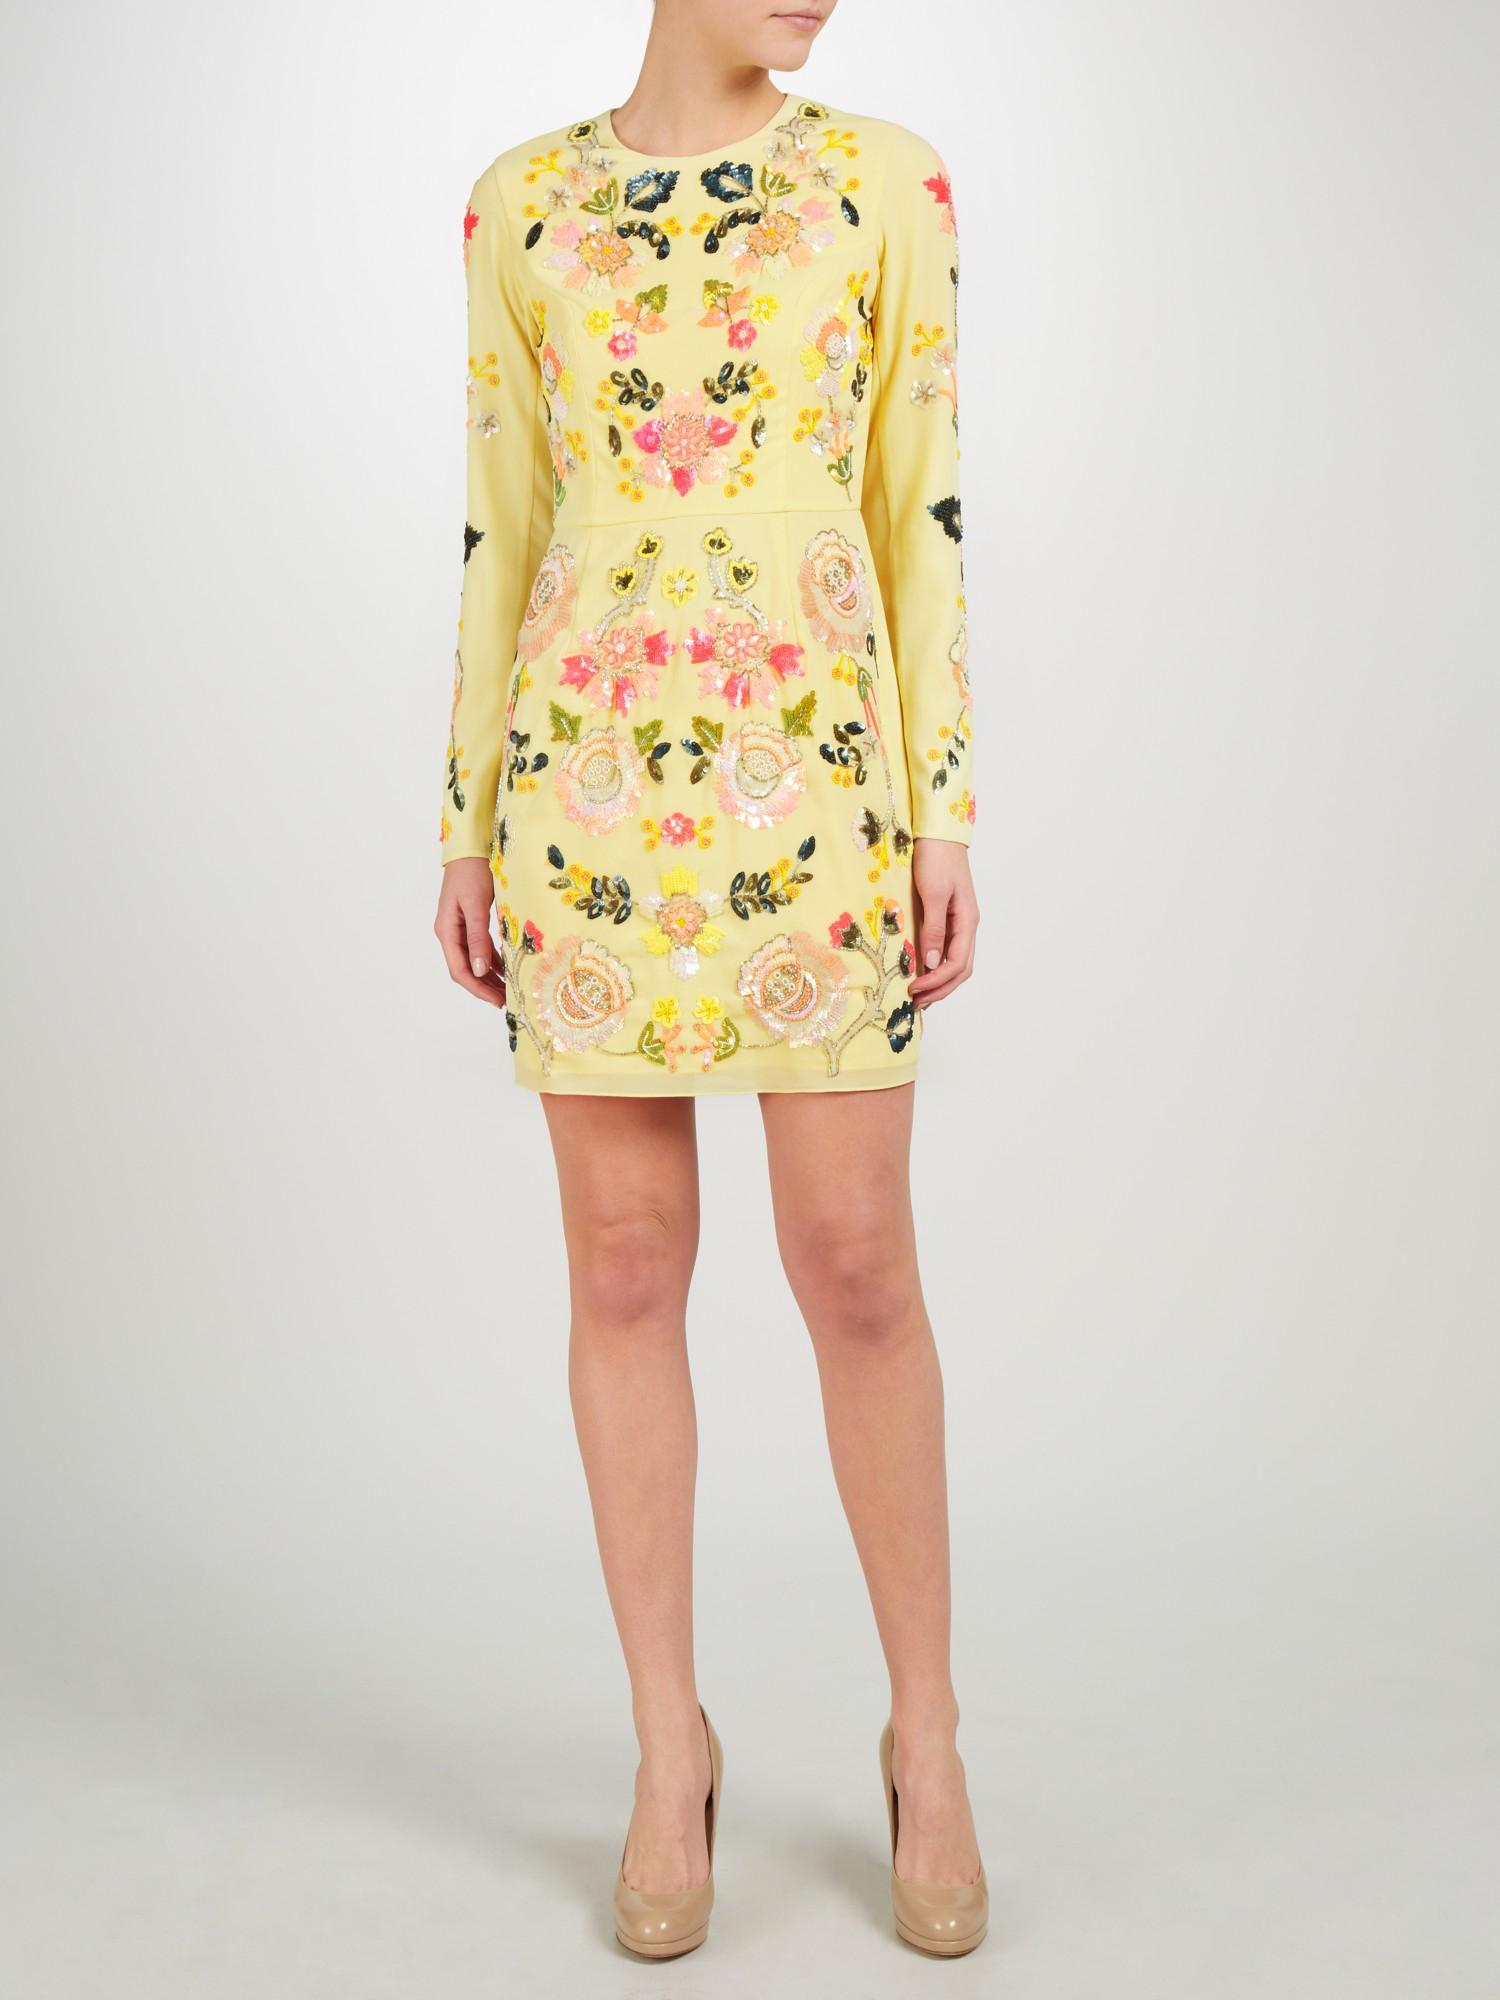 Gallery Women S Summer Dresses